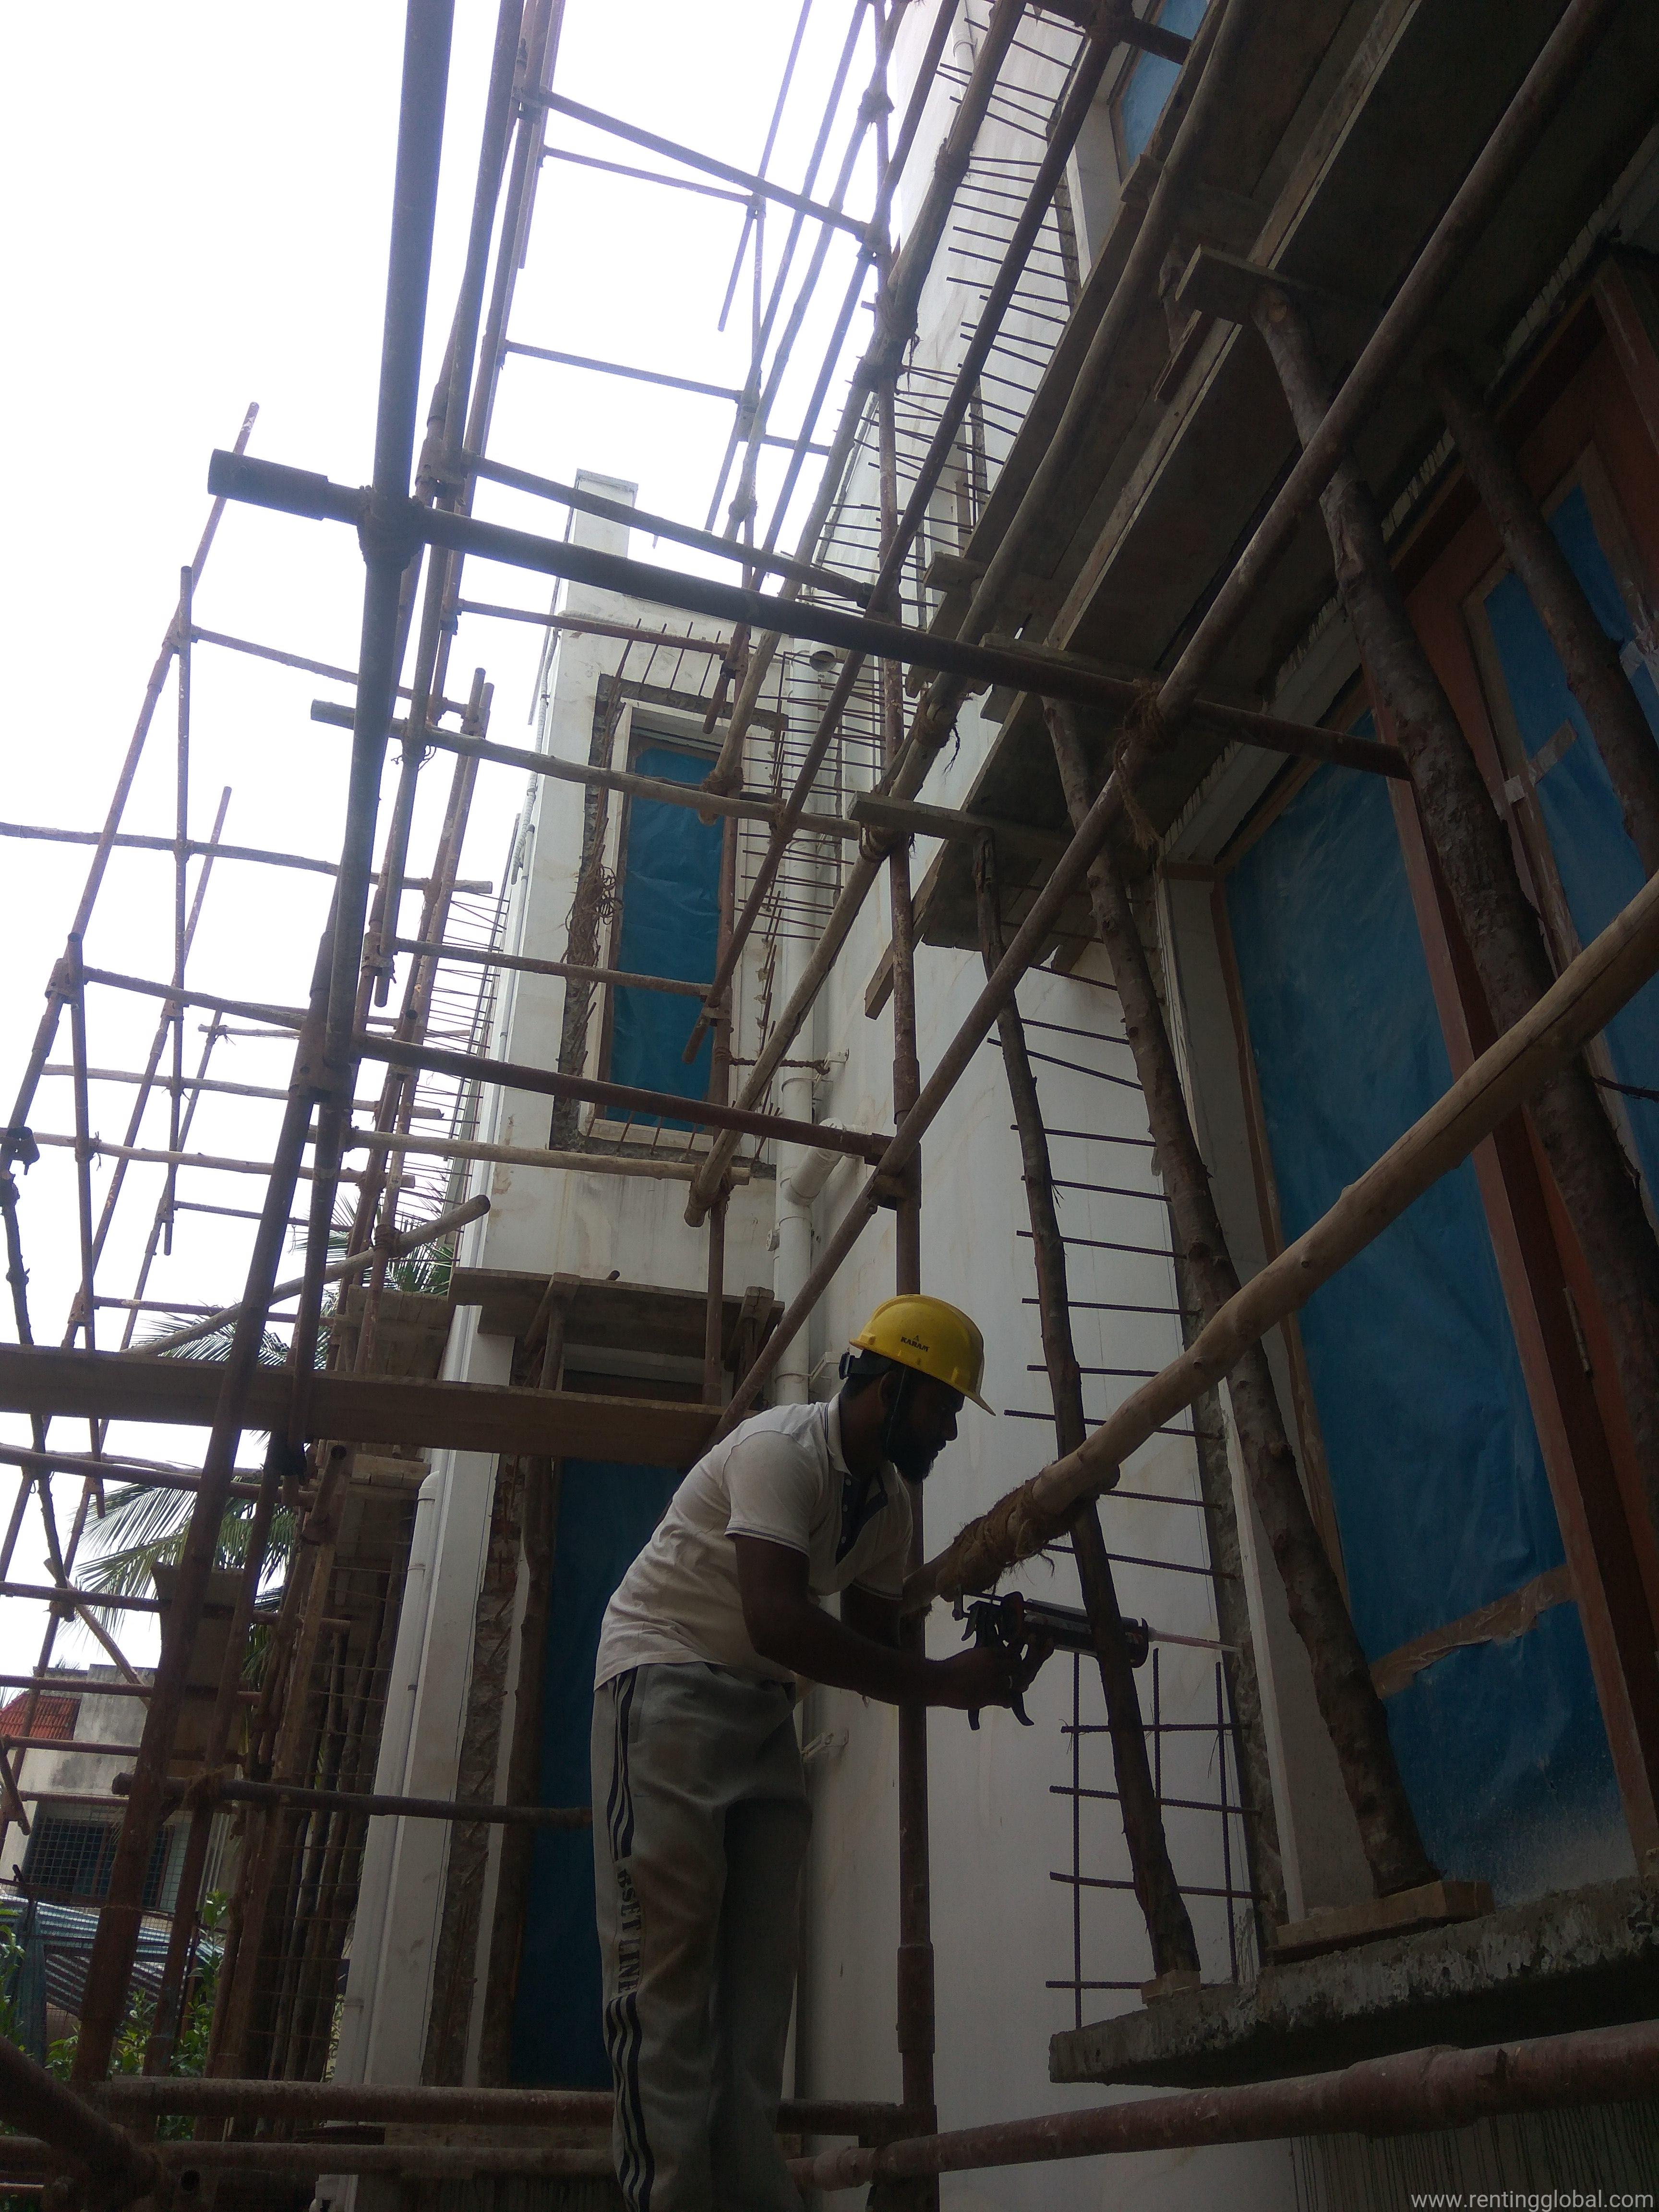 www.rentingglobal.com, renting, global, 4, Kalasathamman Koil St, Chellammal Nagar, Ramapuram, Chennai, Tamil Nadu 600089, India, lockset fixing contractors in chennai,hilti chemical lokfixing agency in chennai,bosch fisher chemical rebar fixing agency in chennai,rebar grouting contractors in chennai,fosroc lokfix chemical grouting contractors in chennai,hilti epoxy chemical grouting agency in chennai,rebarring services work agency in chennai,epoxy chemical rebar fixing work contractor,concrete slab extension chemical grouting agency in chennai, GANMAR Lockset chemical Grouting agency in chennai 9841009229